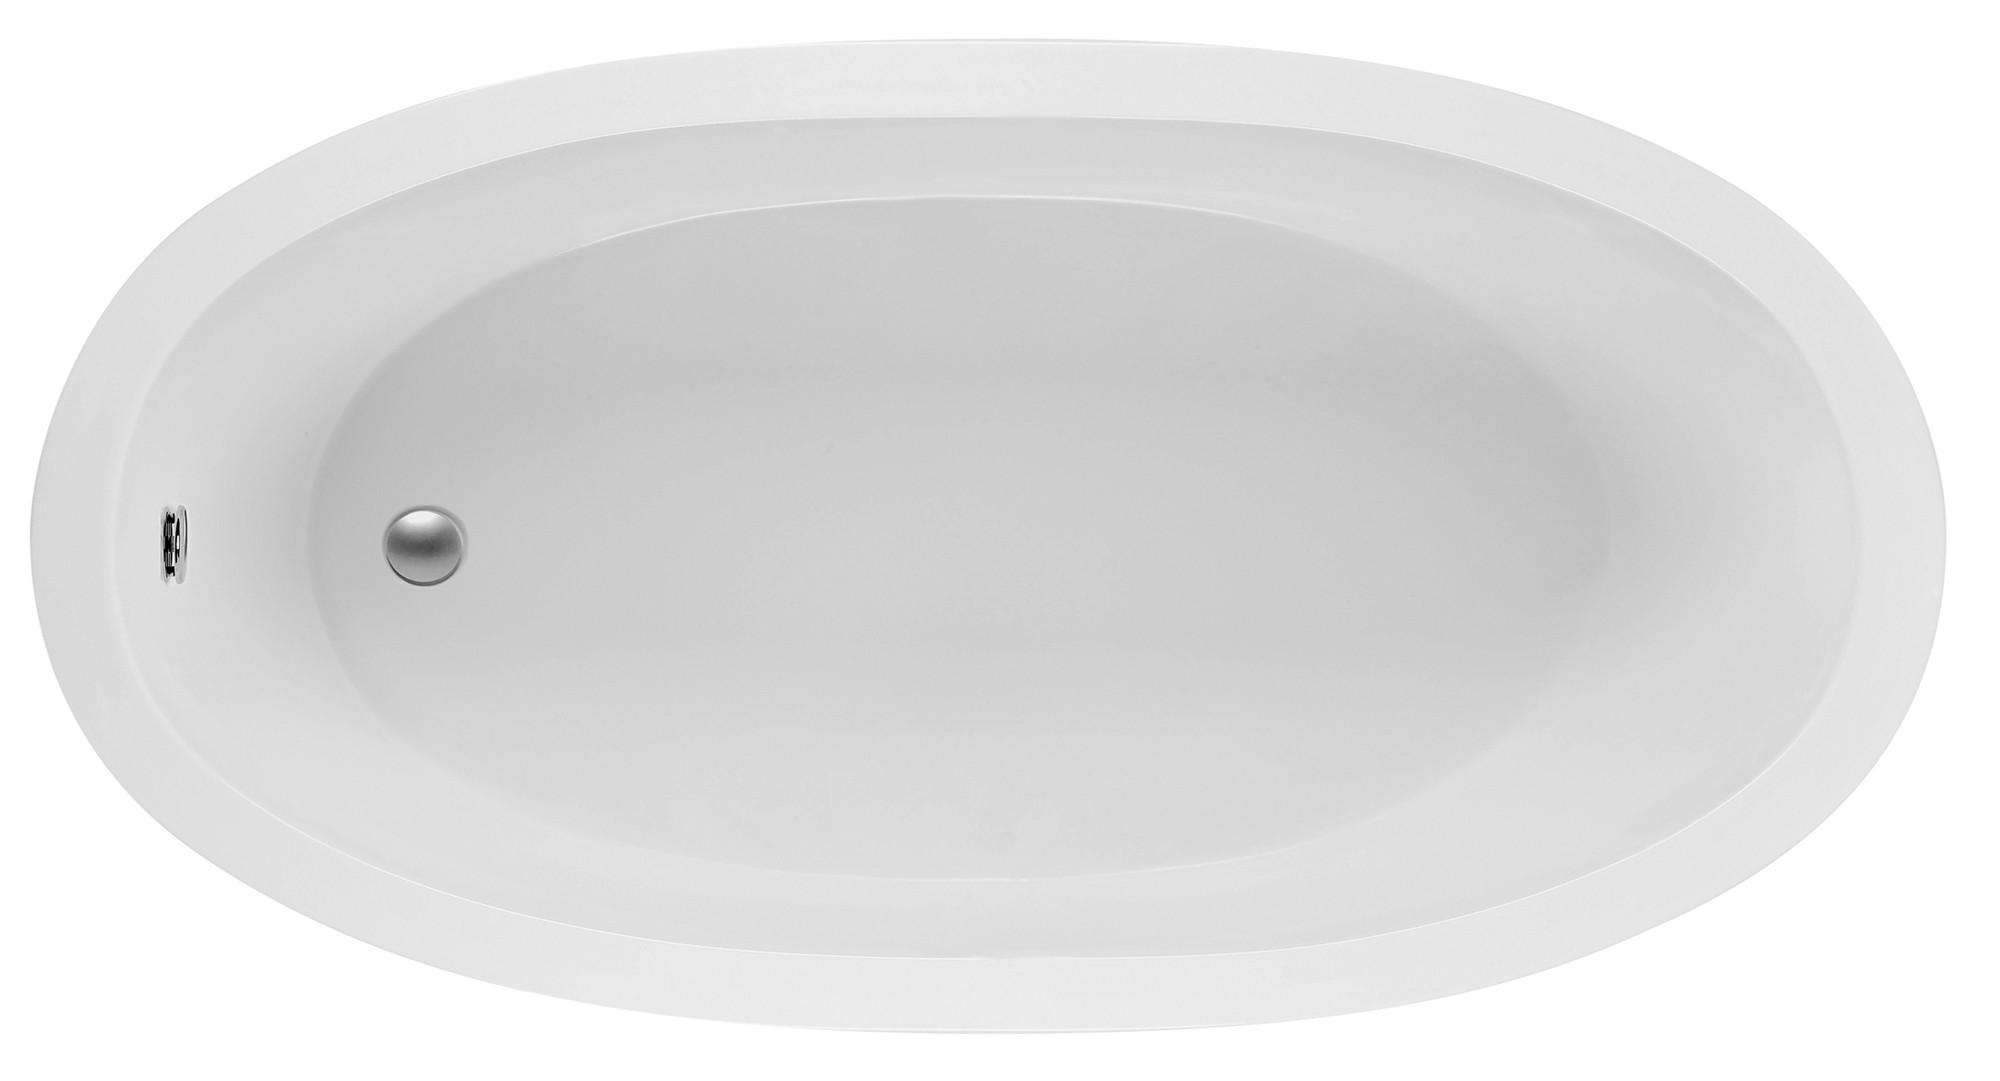 Reliance R7236ODIS 72 Inch Oval End Drain Soaking Bath